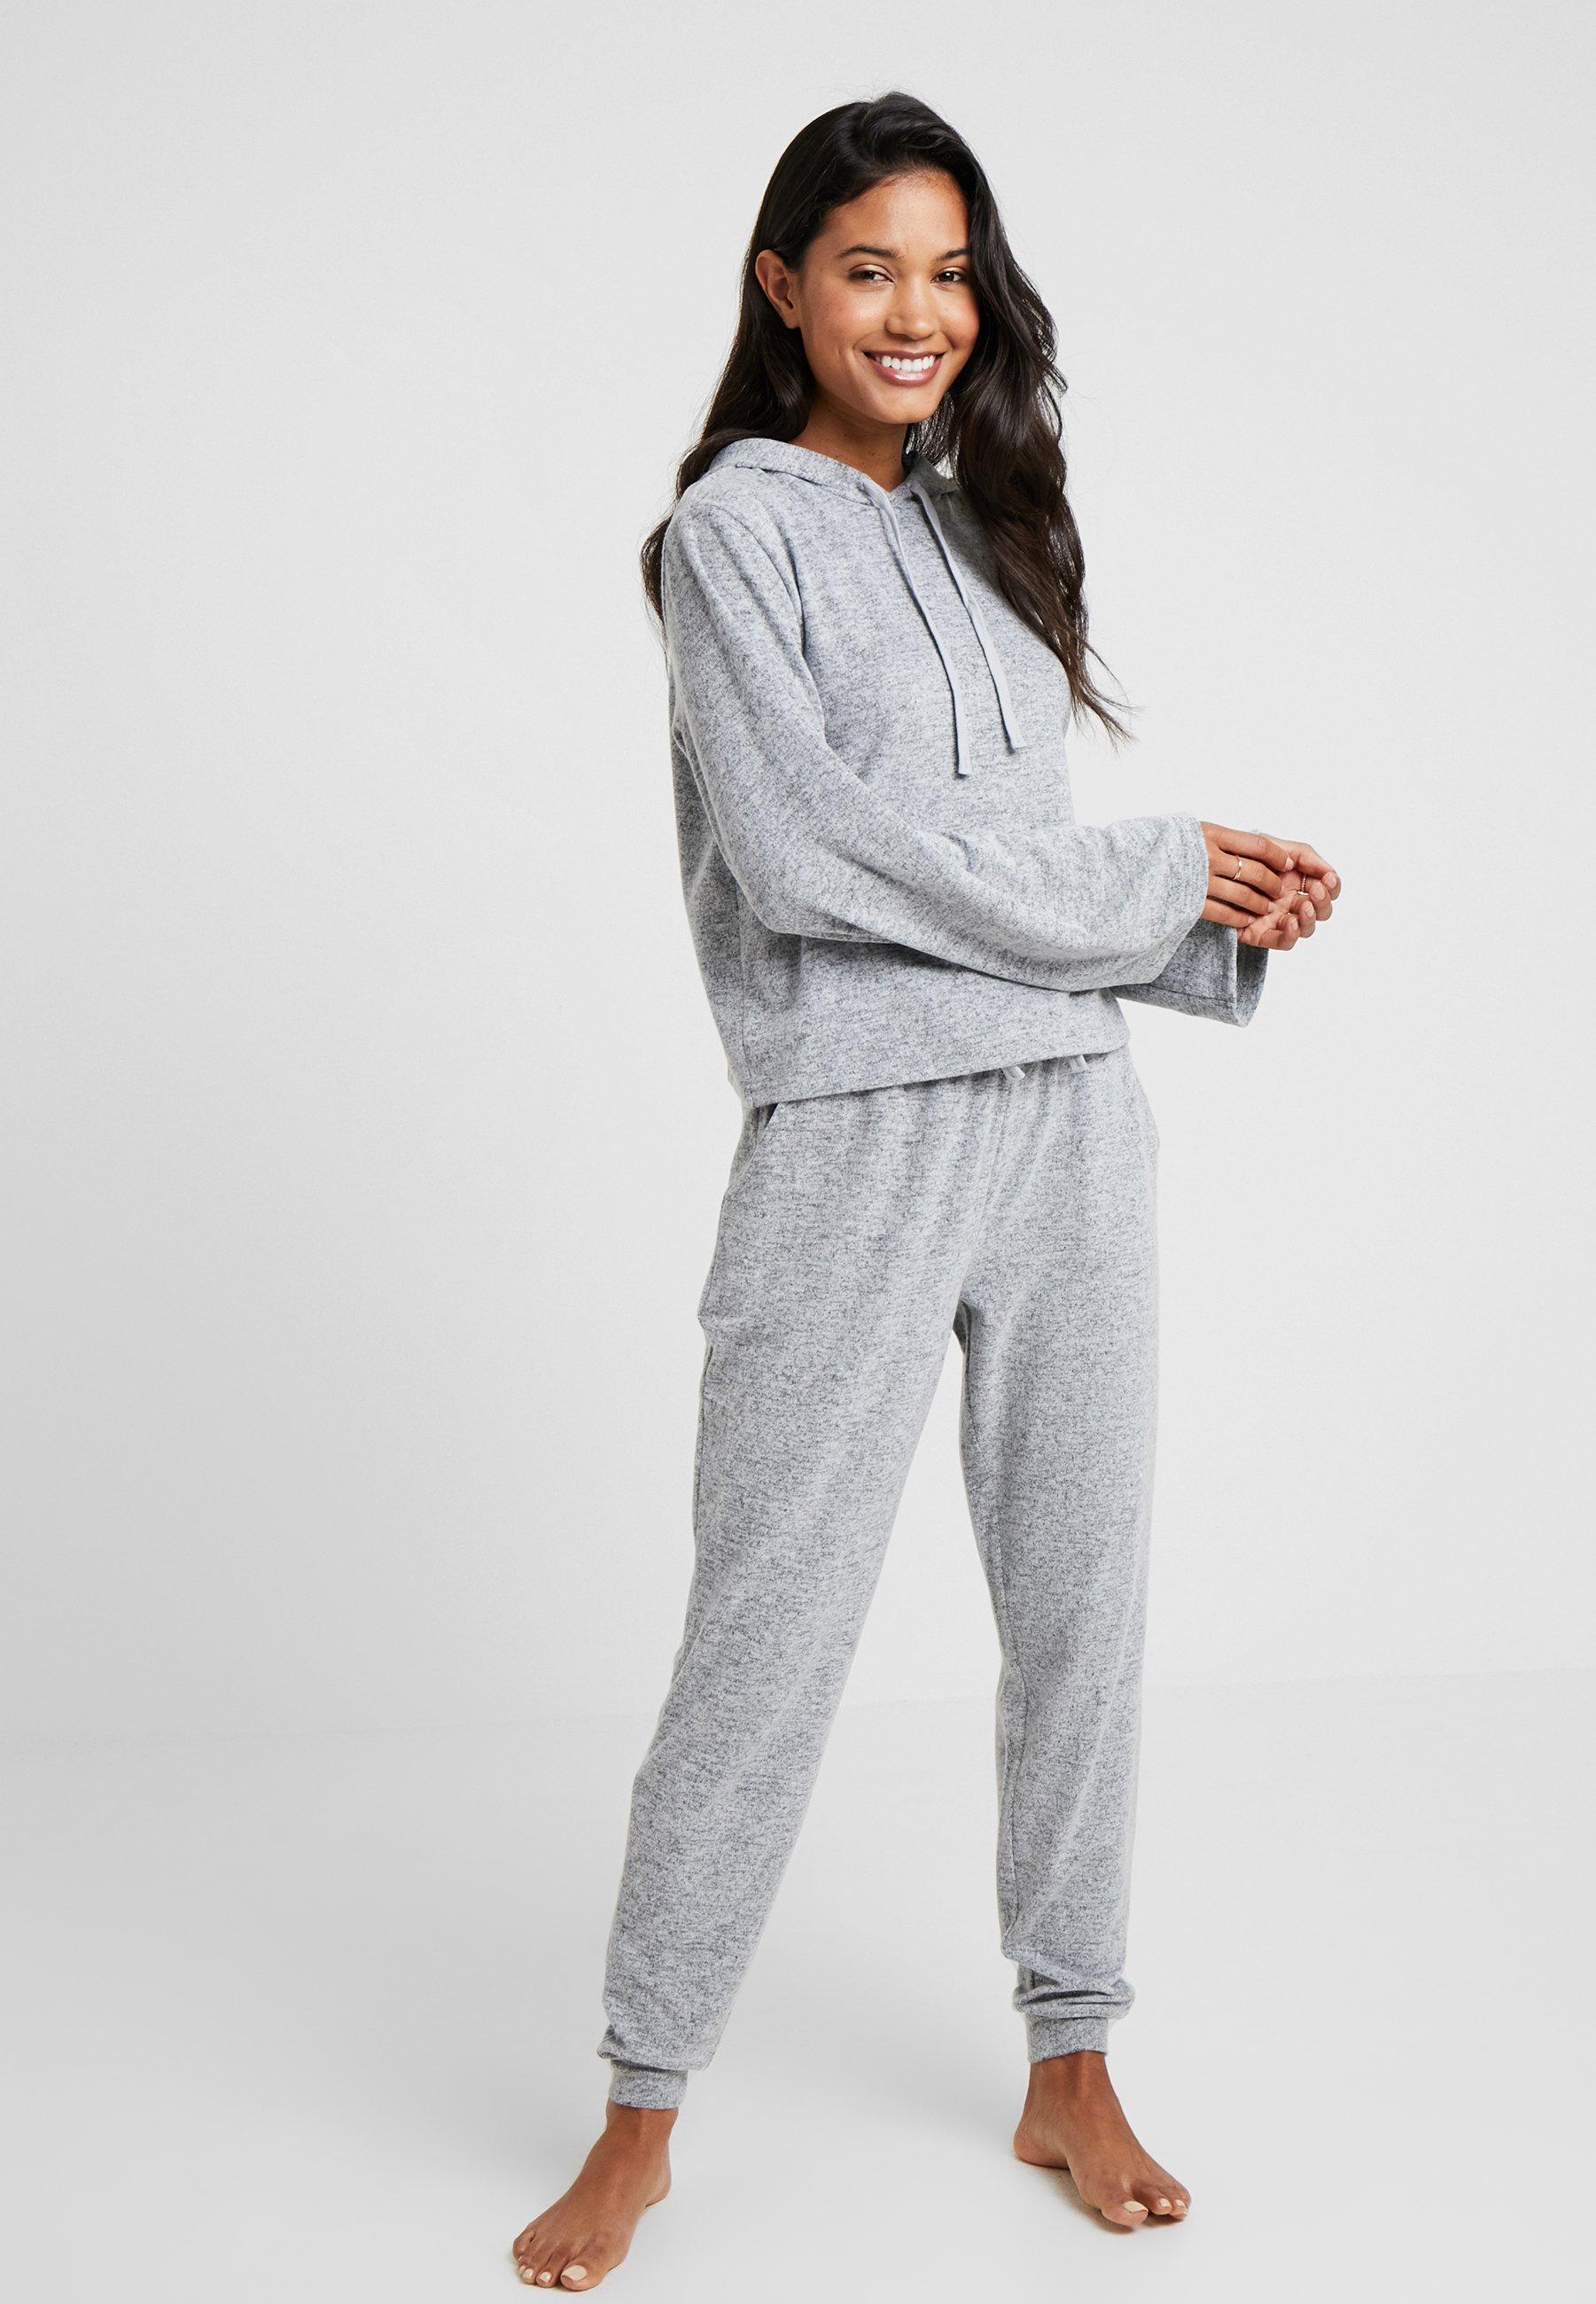 Essentials Essentials Zalando Zalando PyjamaGrey PyjamaGrey Zalando PyjamaGrey Zalando Essentials 0Nn8wOPkXZ